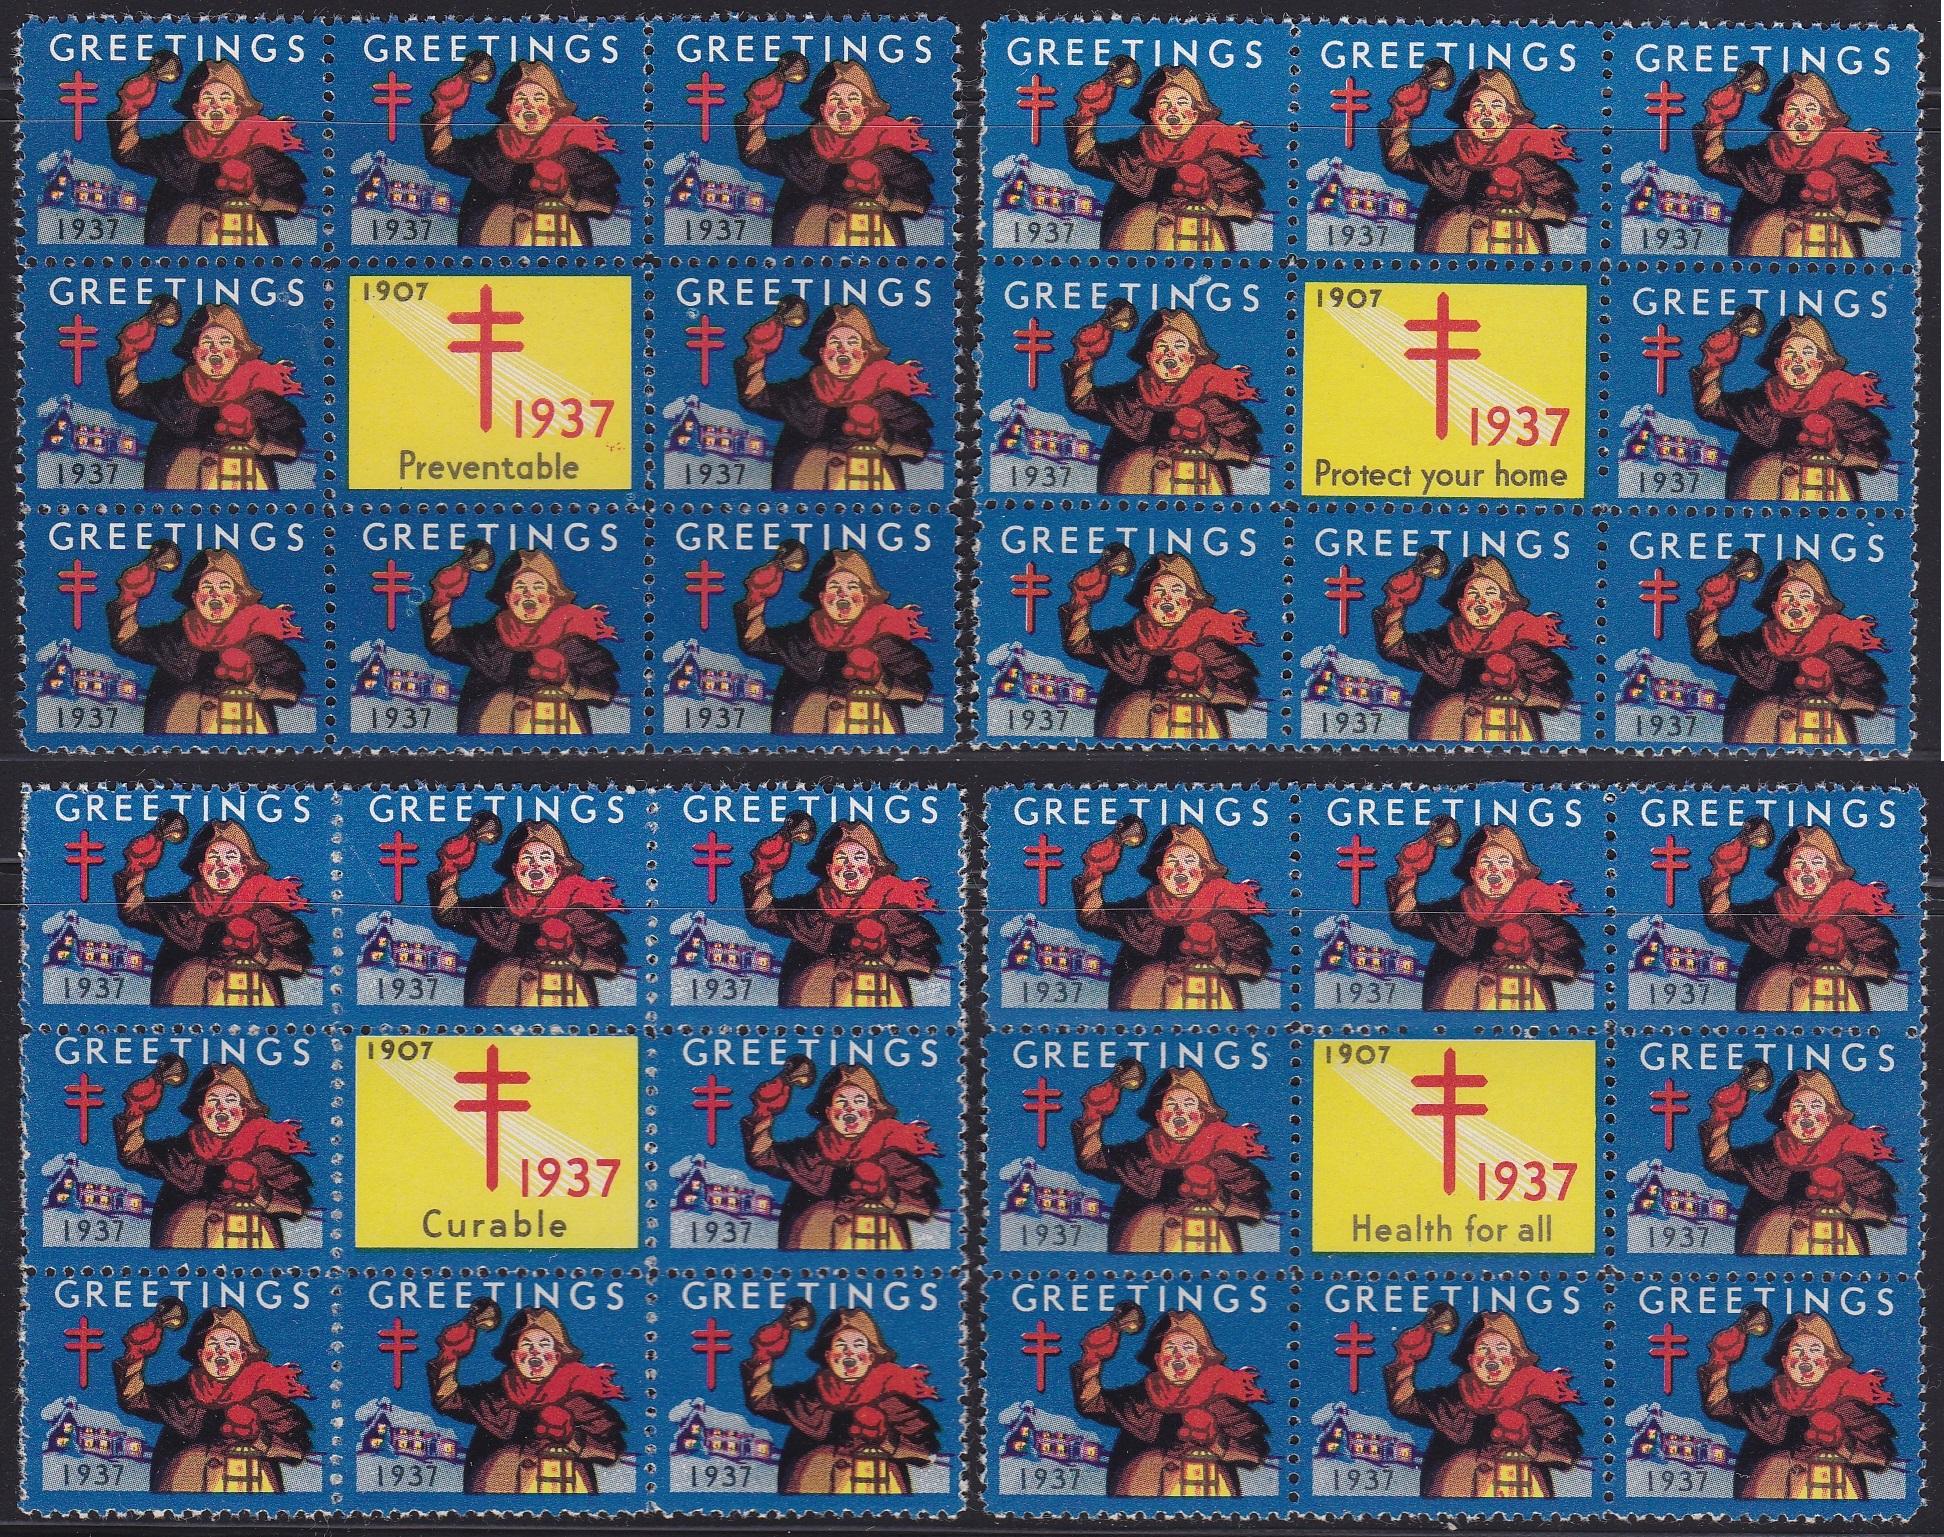 1937 US Christmas Seal slogan block set